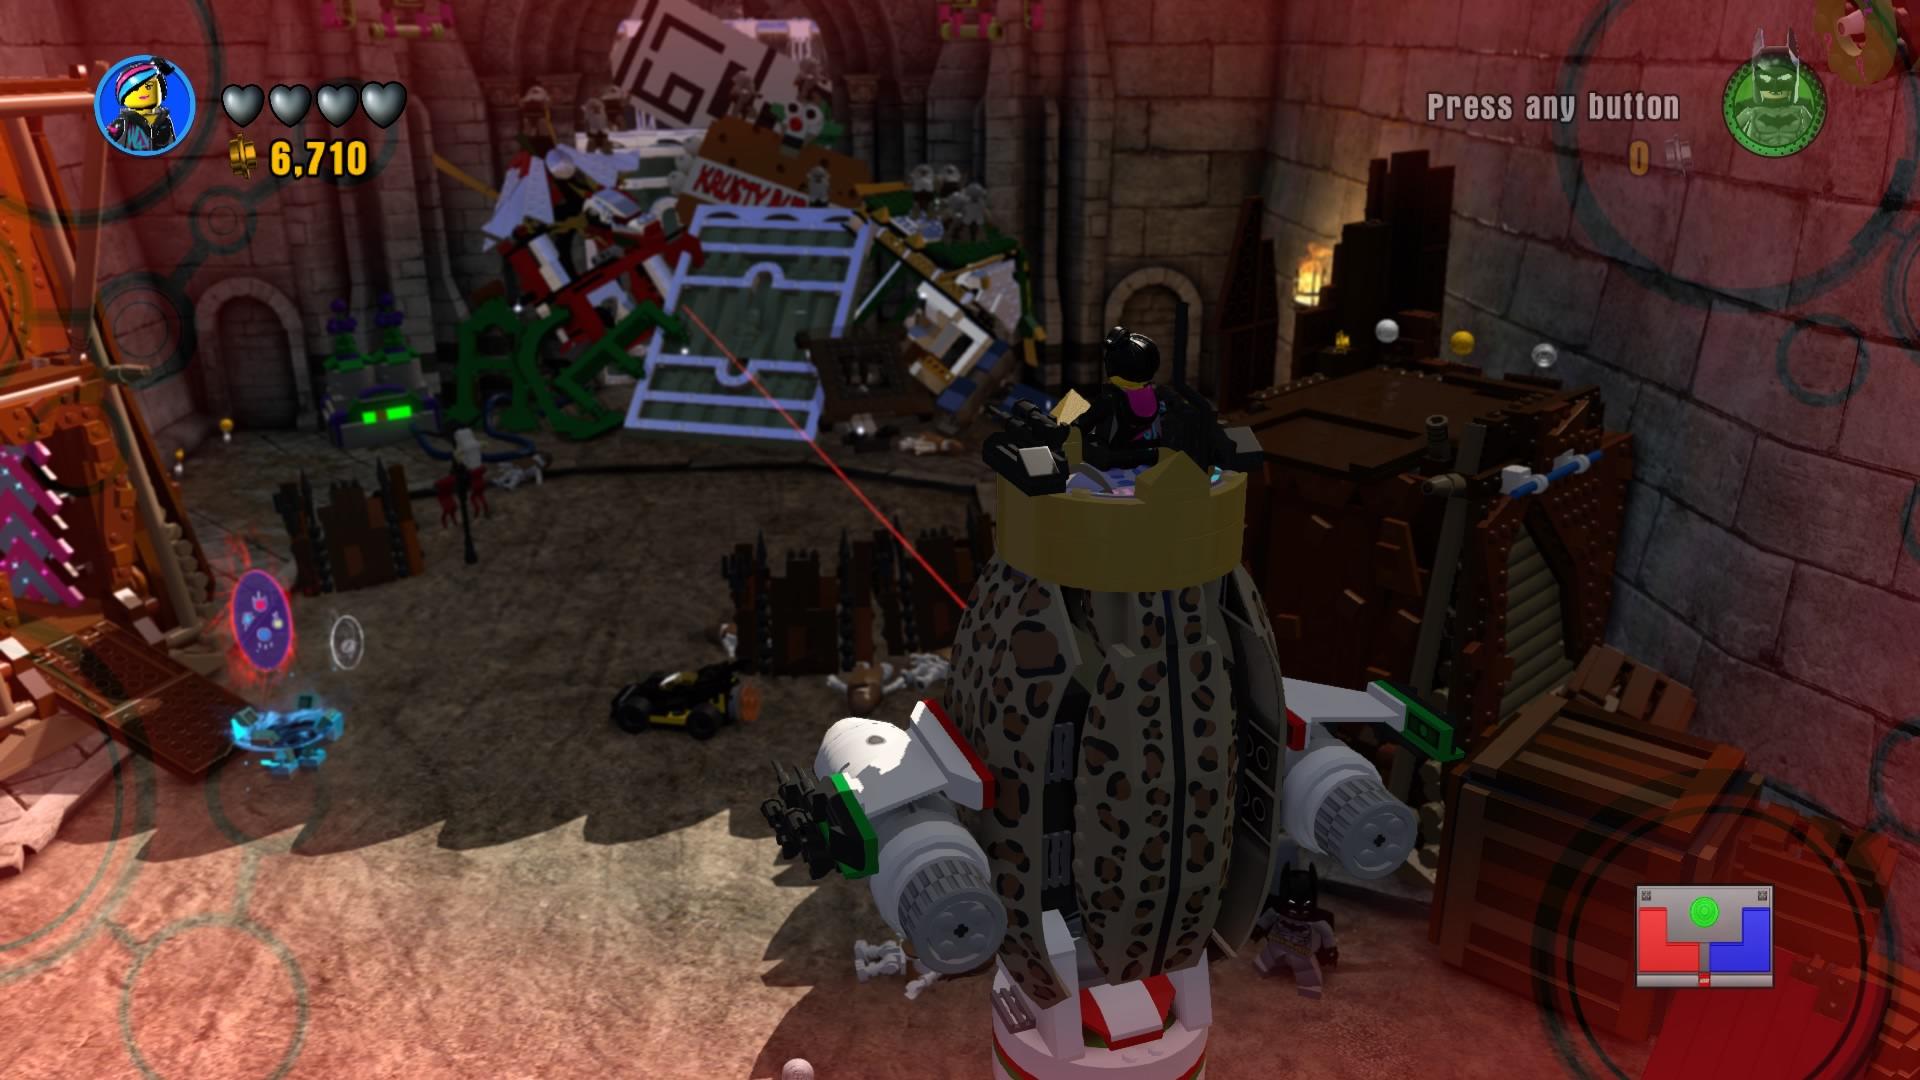 LEGO Dimensions: Story Mode Walkthrough | Walkthroughs | The Escapist